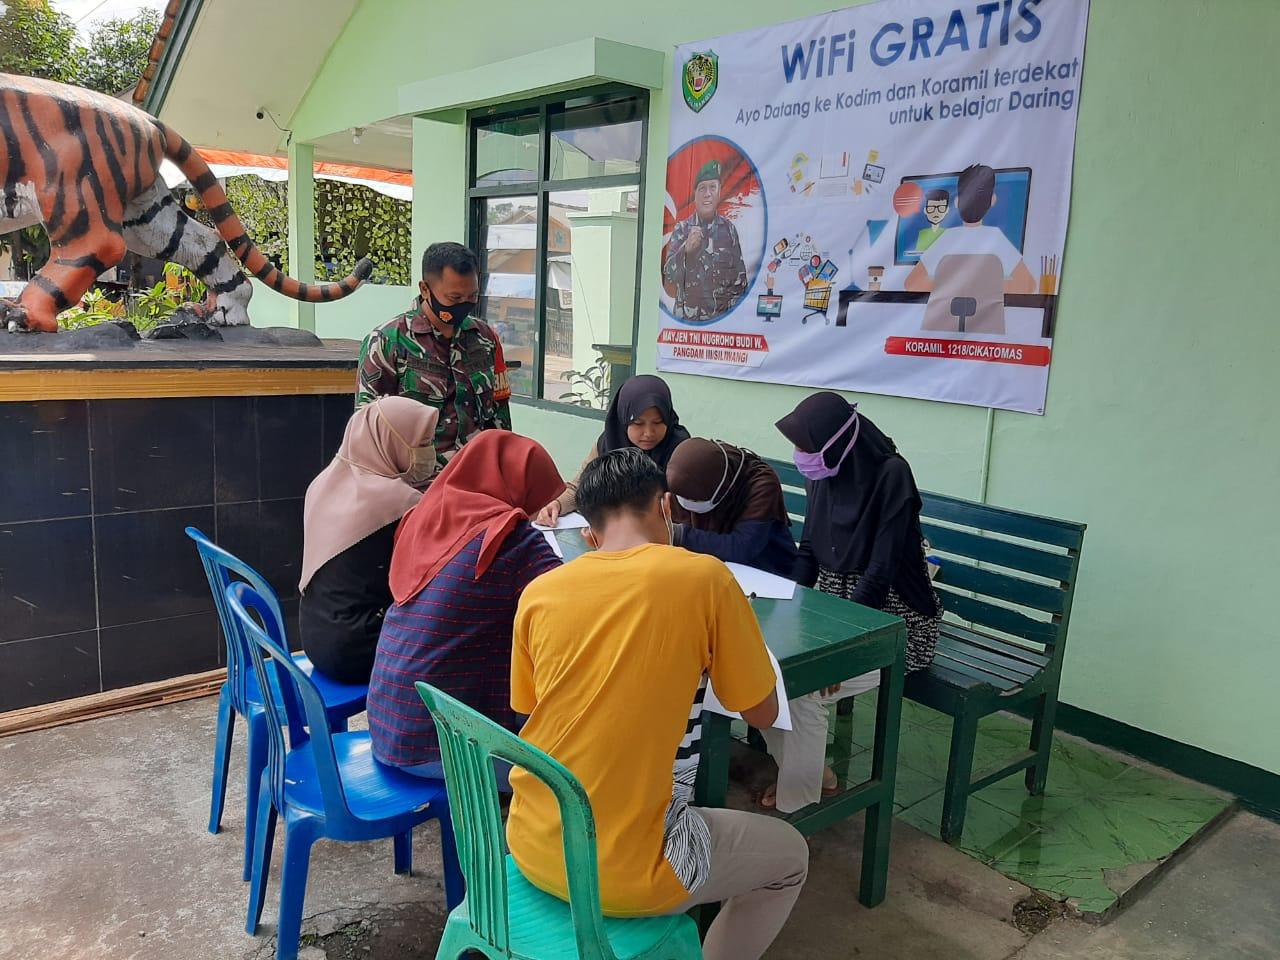 Sudah Berjalan Pekan Kegiatan Belajar Daring Kantor Aula Koramil Jajaran Kodim 0612 Tasikmalaya Indoartnews Com